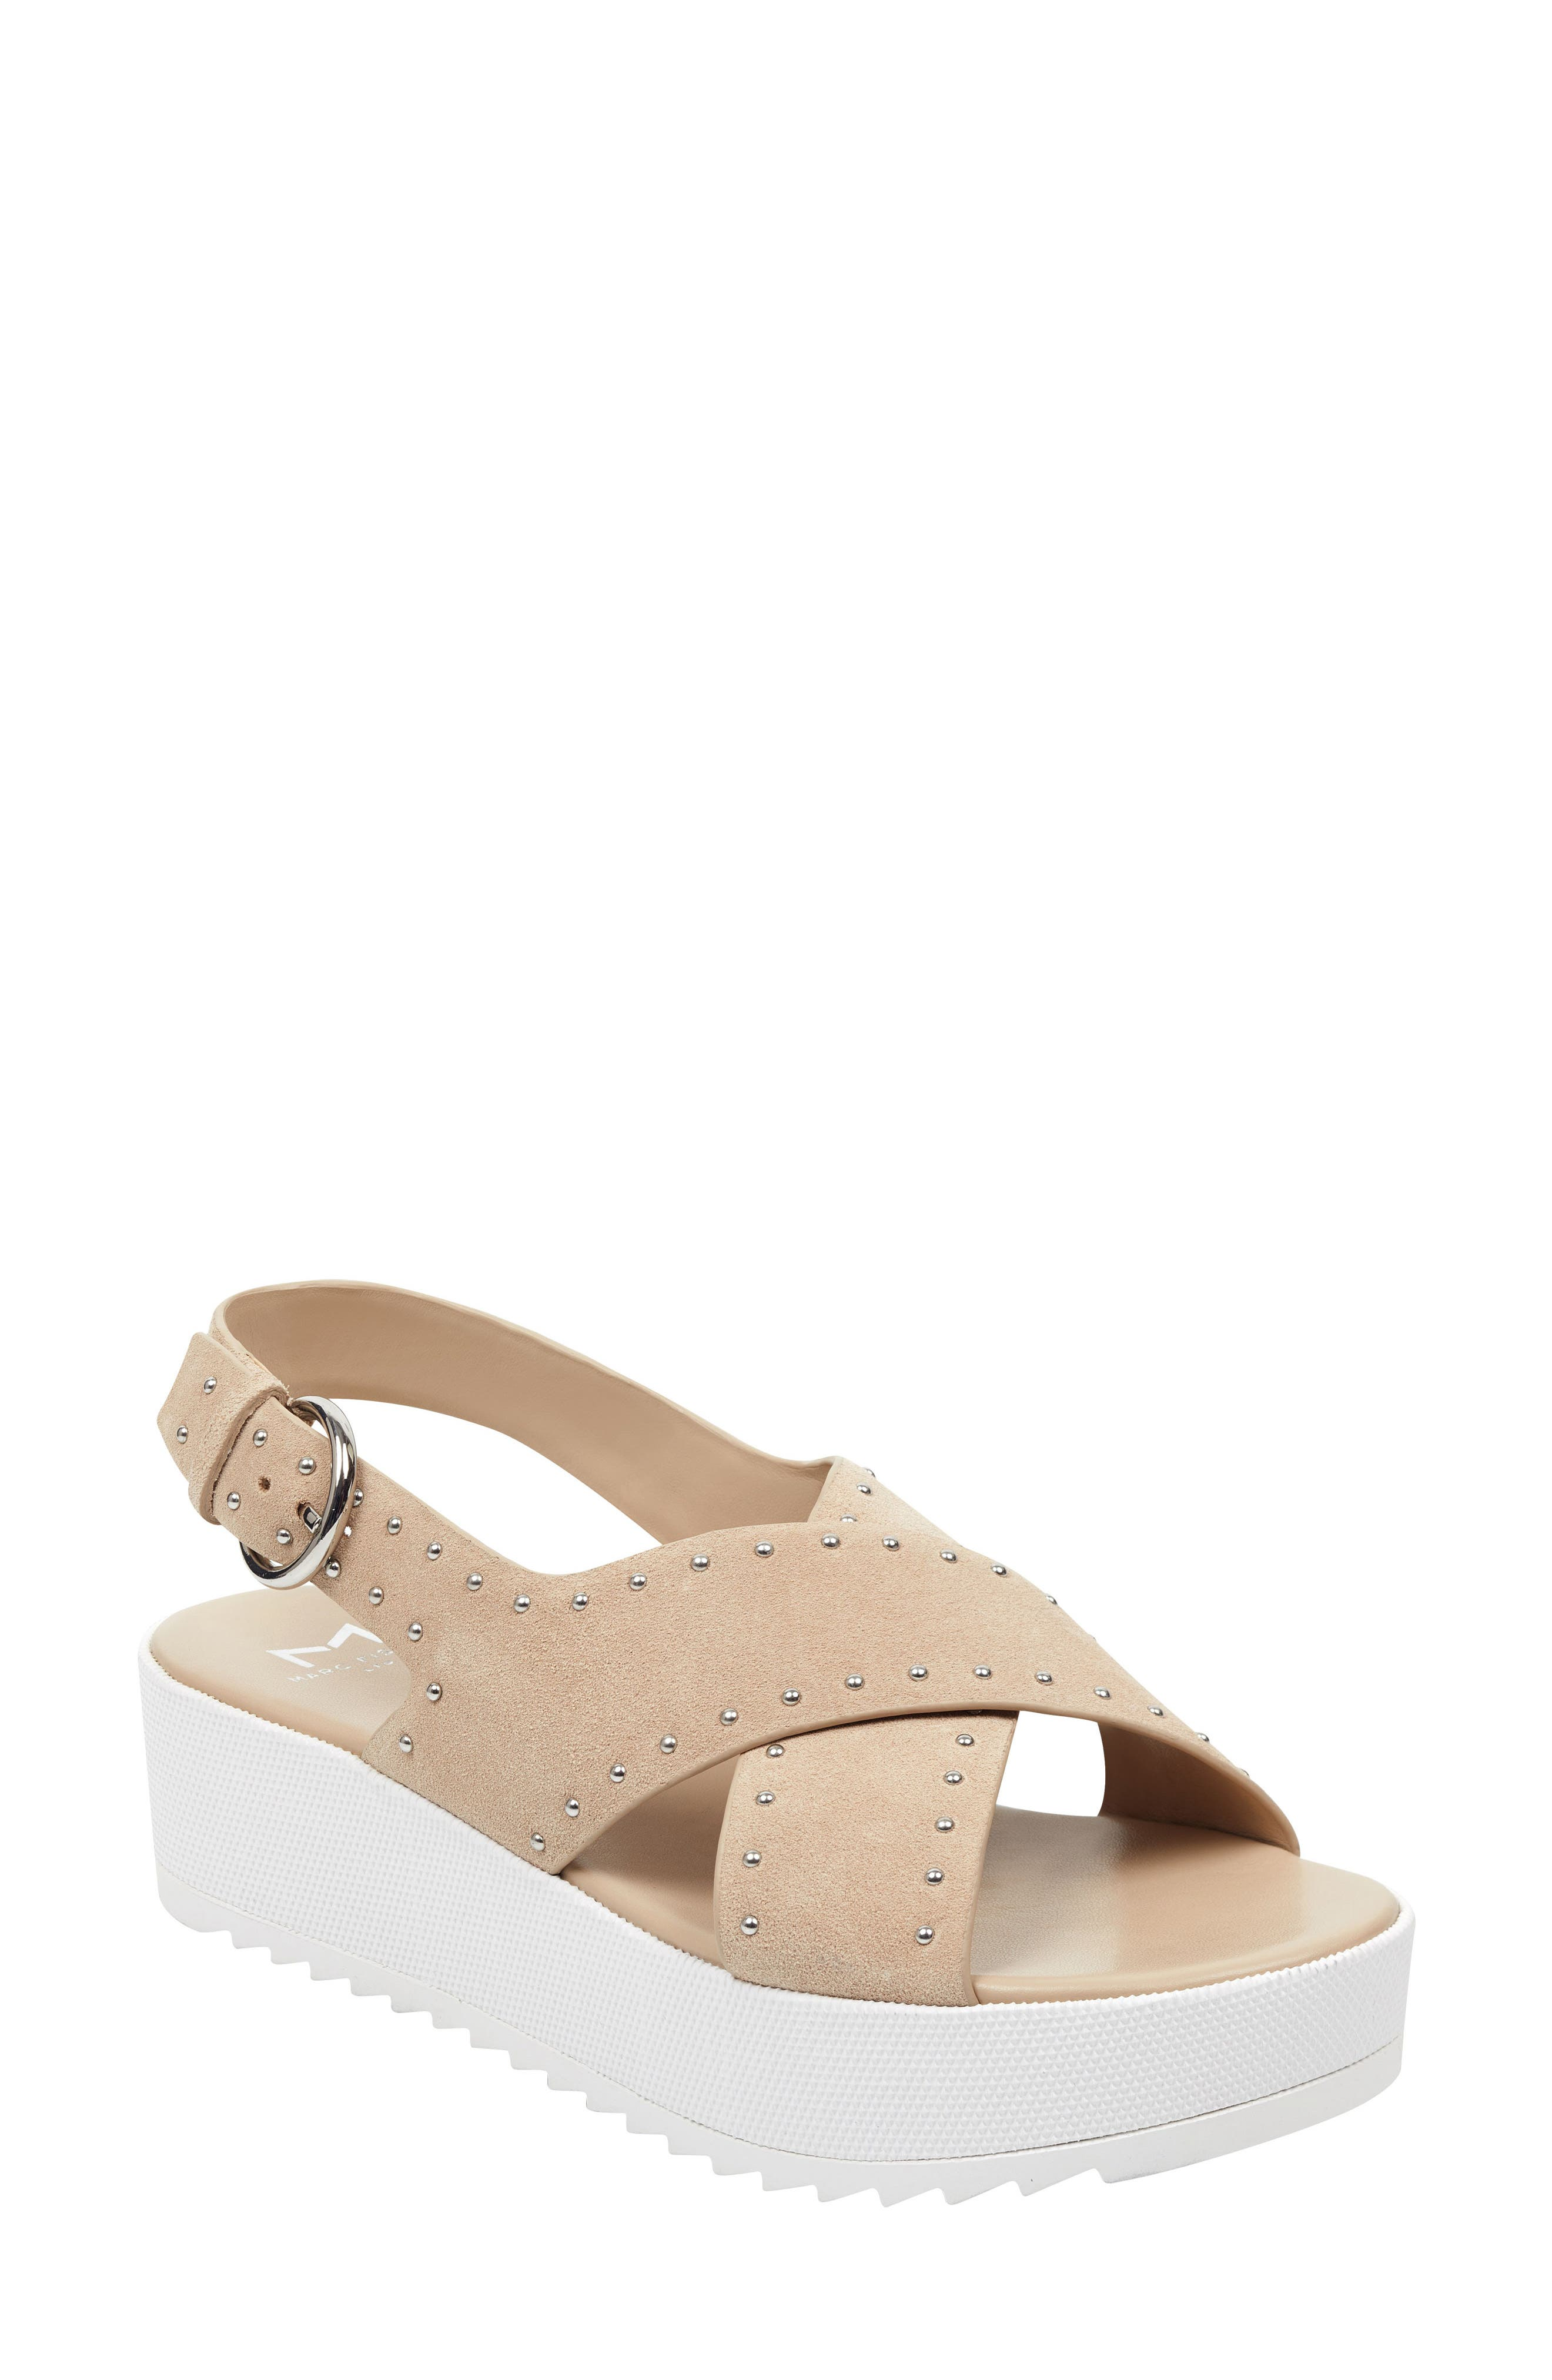 Marc Fisher Ltd Delilah Slingback Sandal, Beige